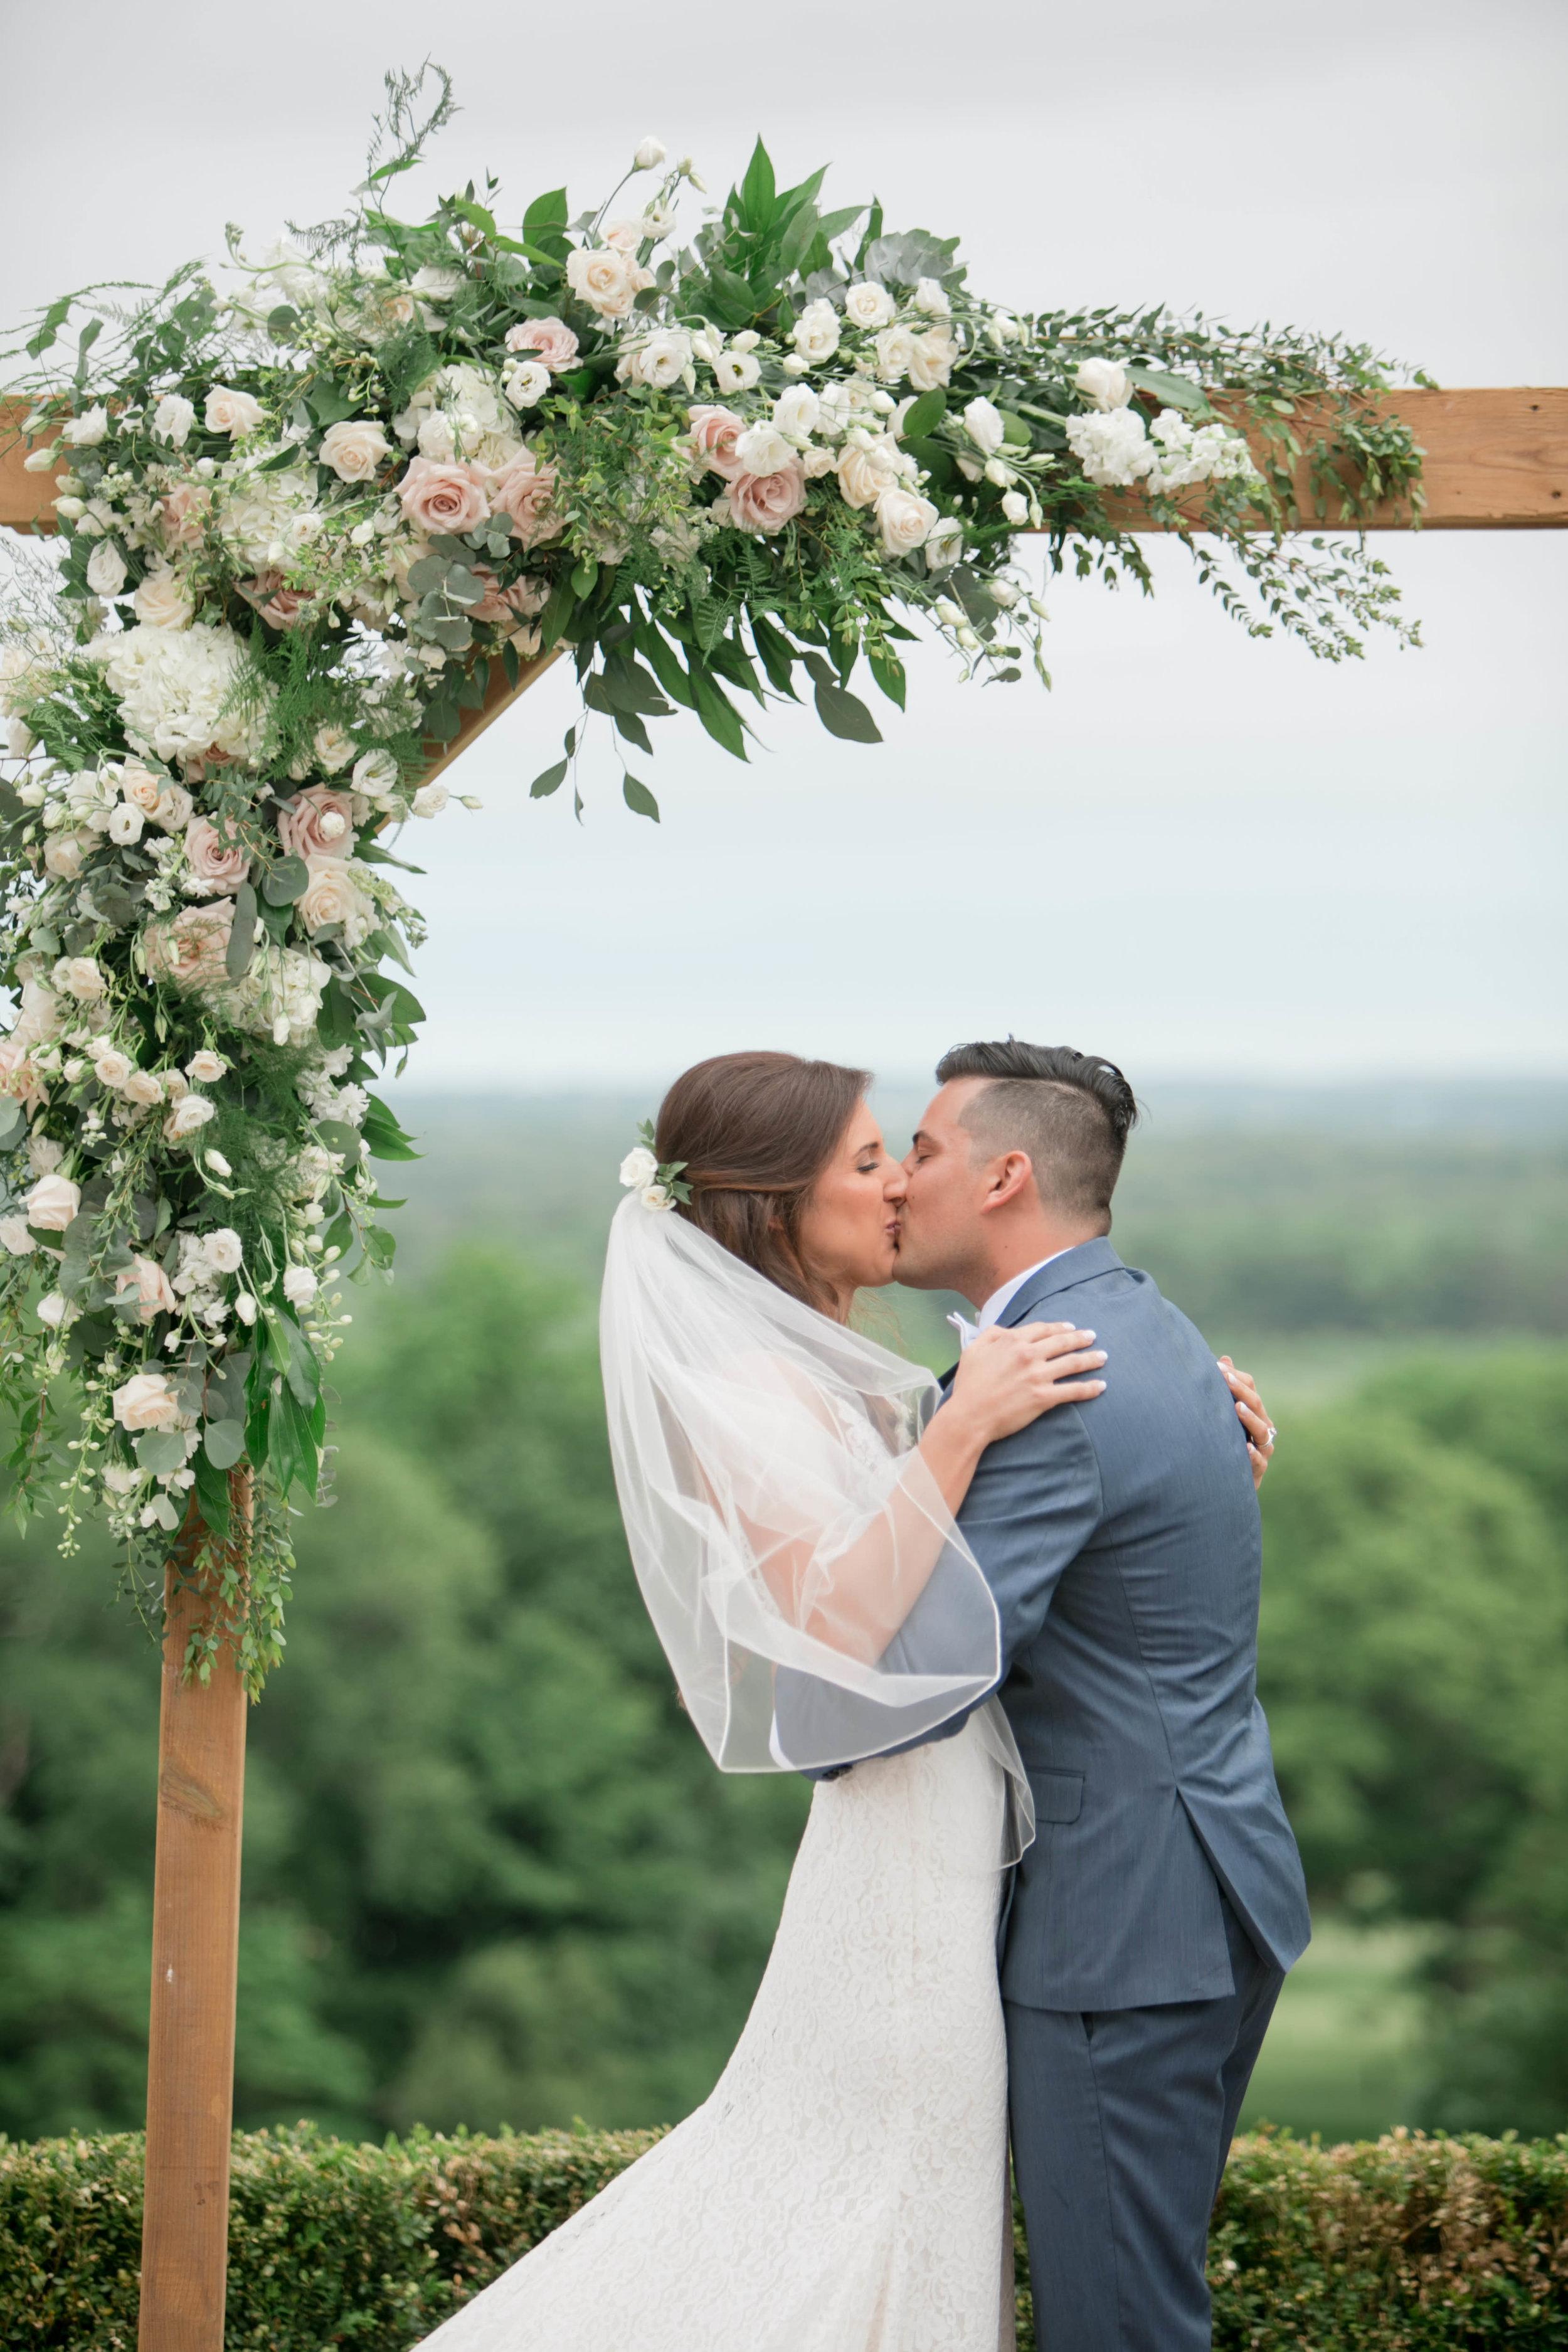 Miranda___Daniel___Daniel_Ricci_Weddings___High_Res._Finals_327.jpg